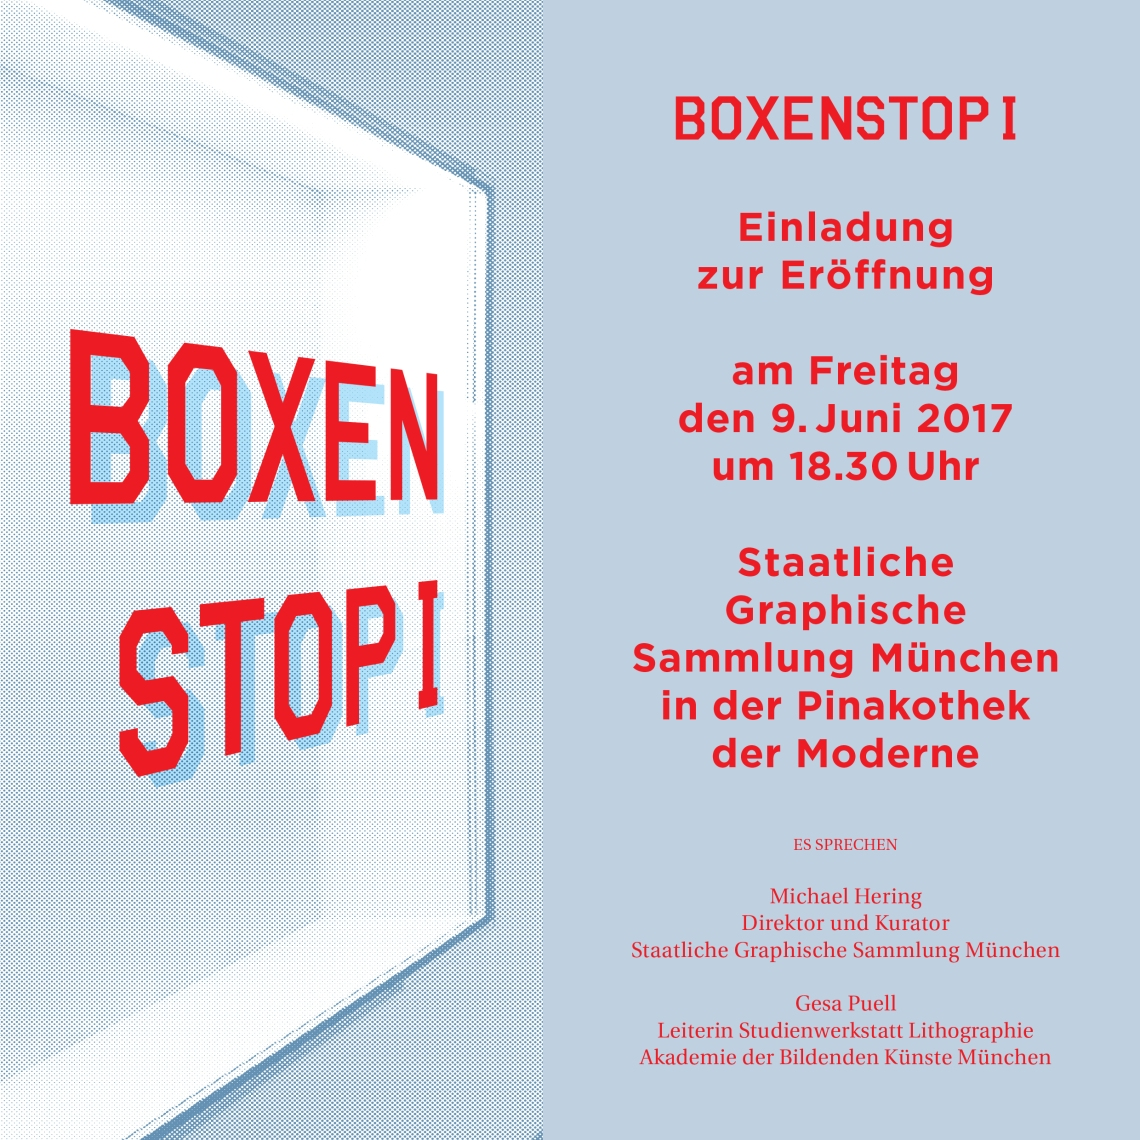 Boxenstop_Einladung-1